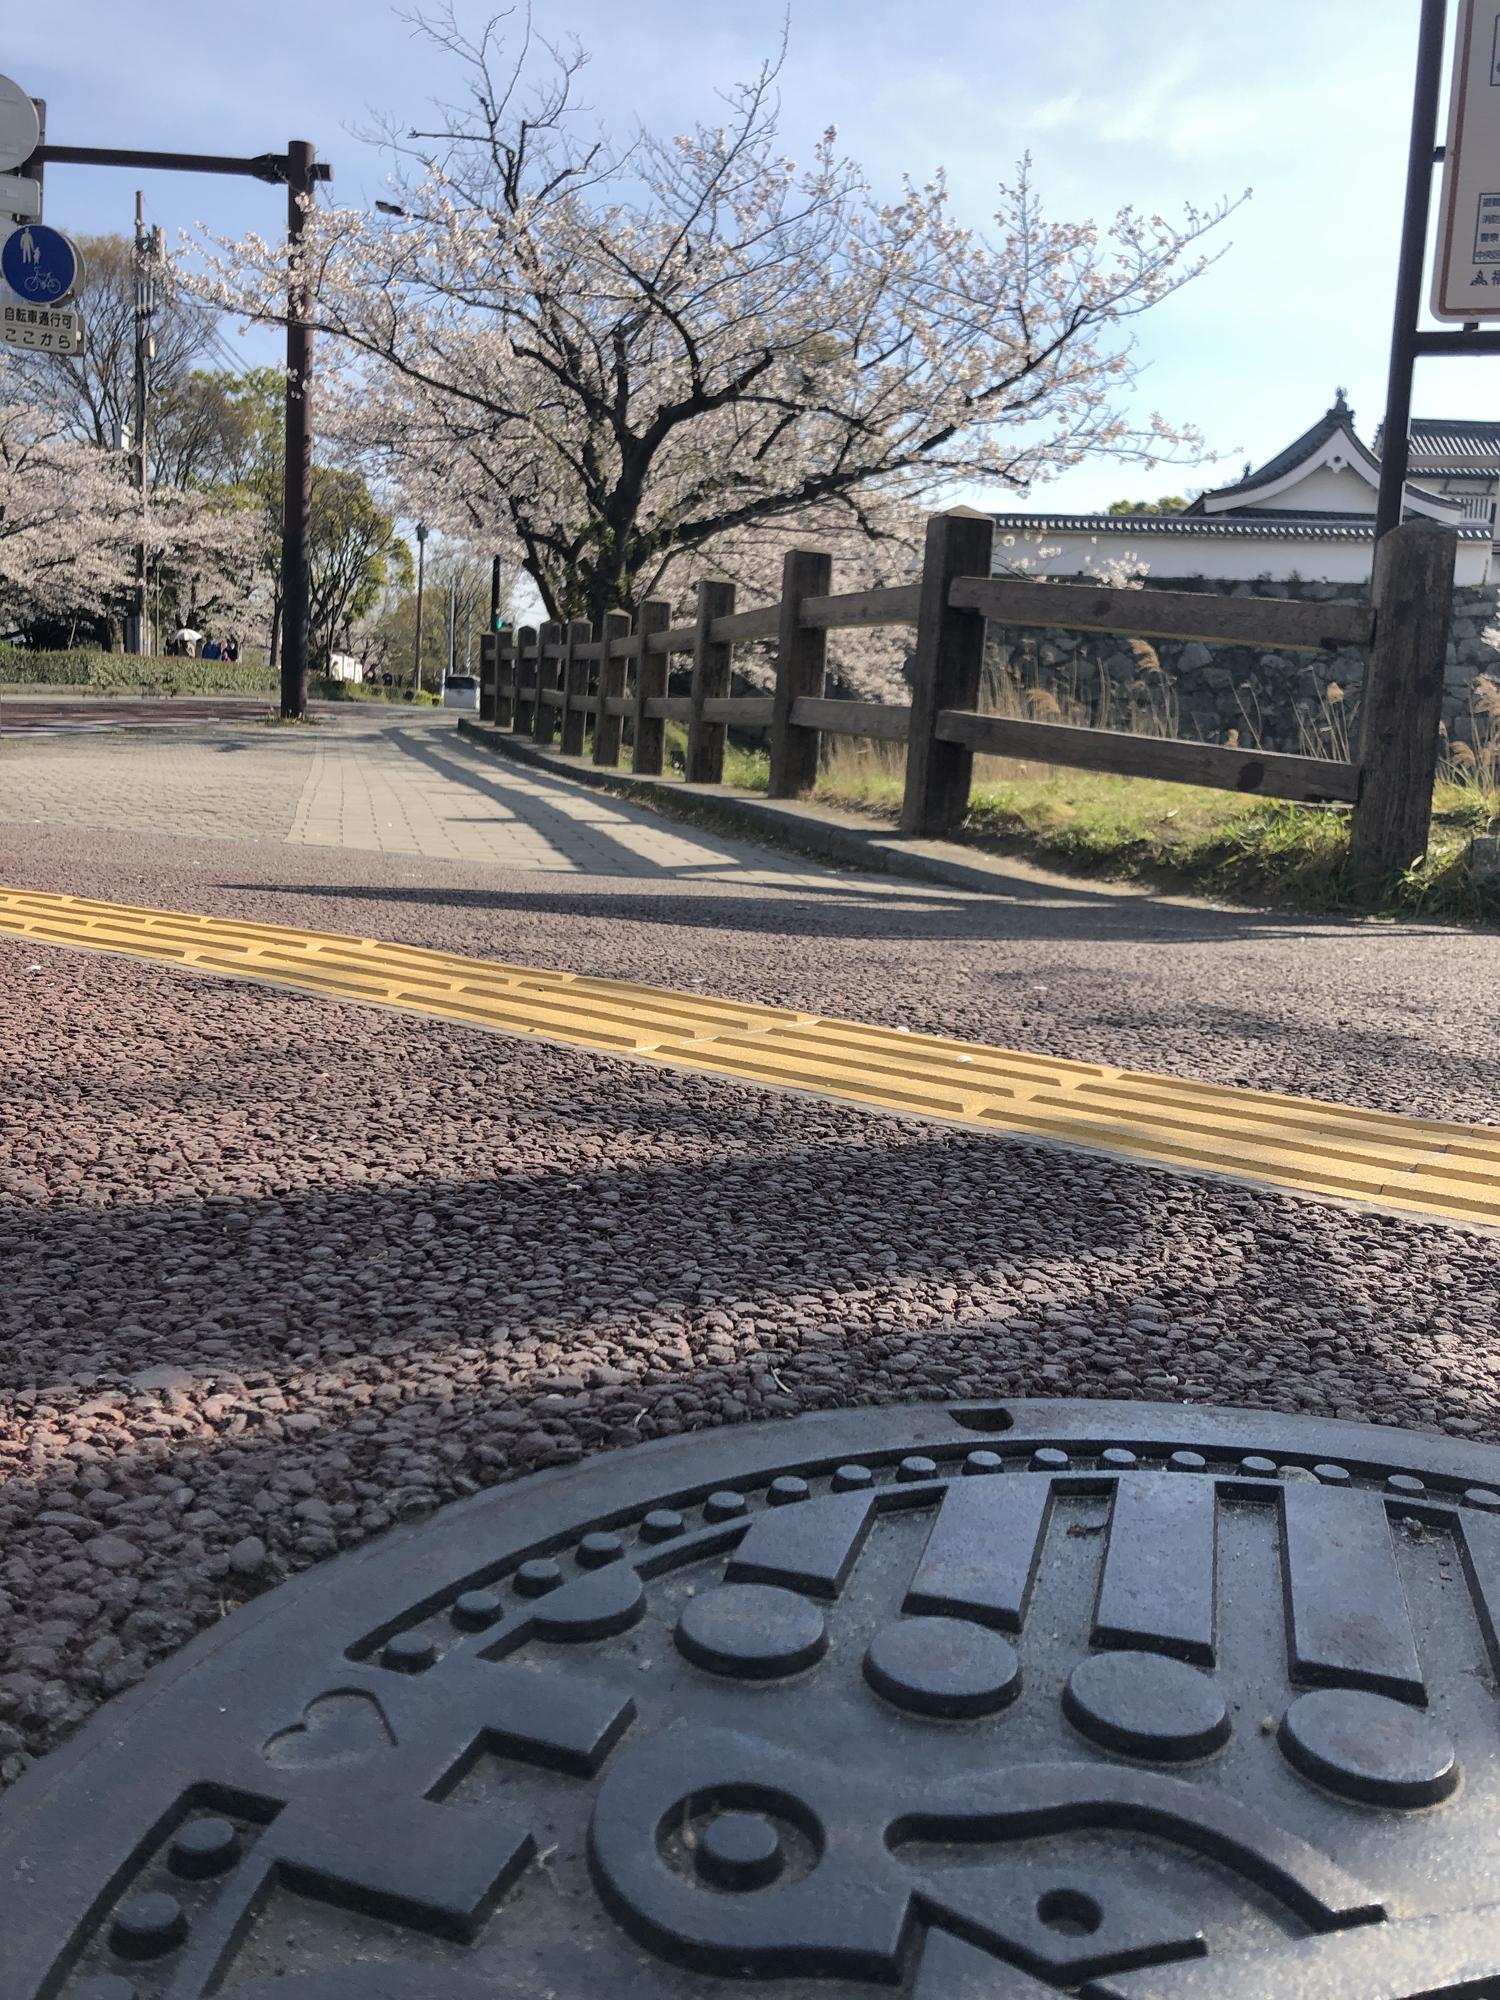 FUKU51 MANHOLE(フクコイマンホール)舞鶴公園の堀端(2019)の画像